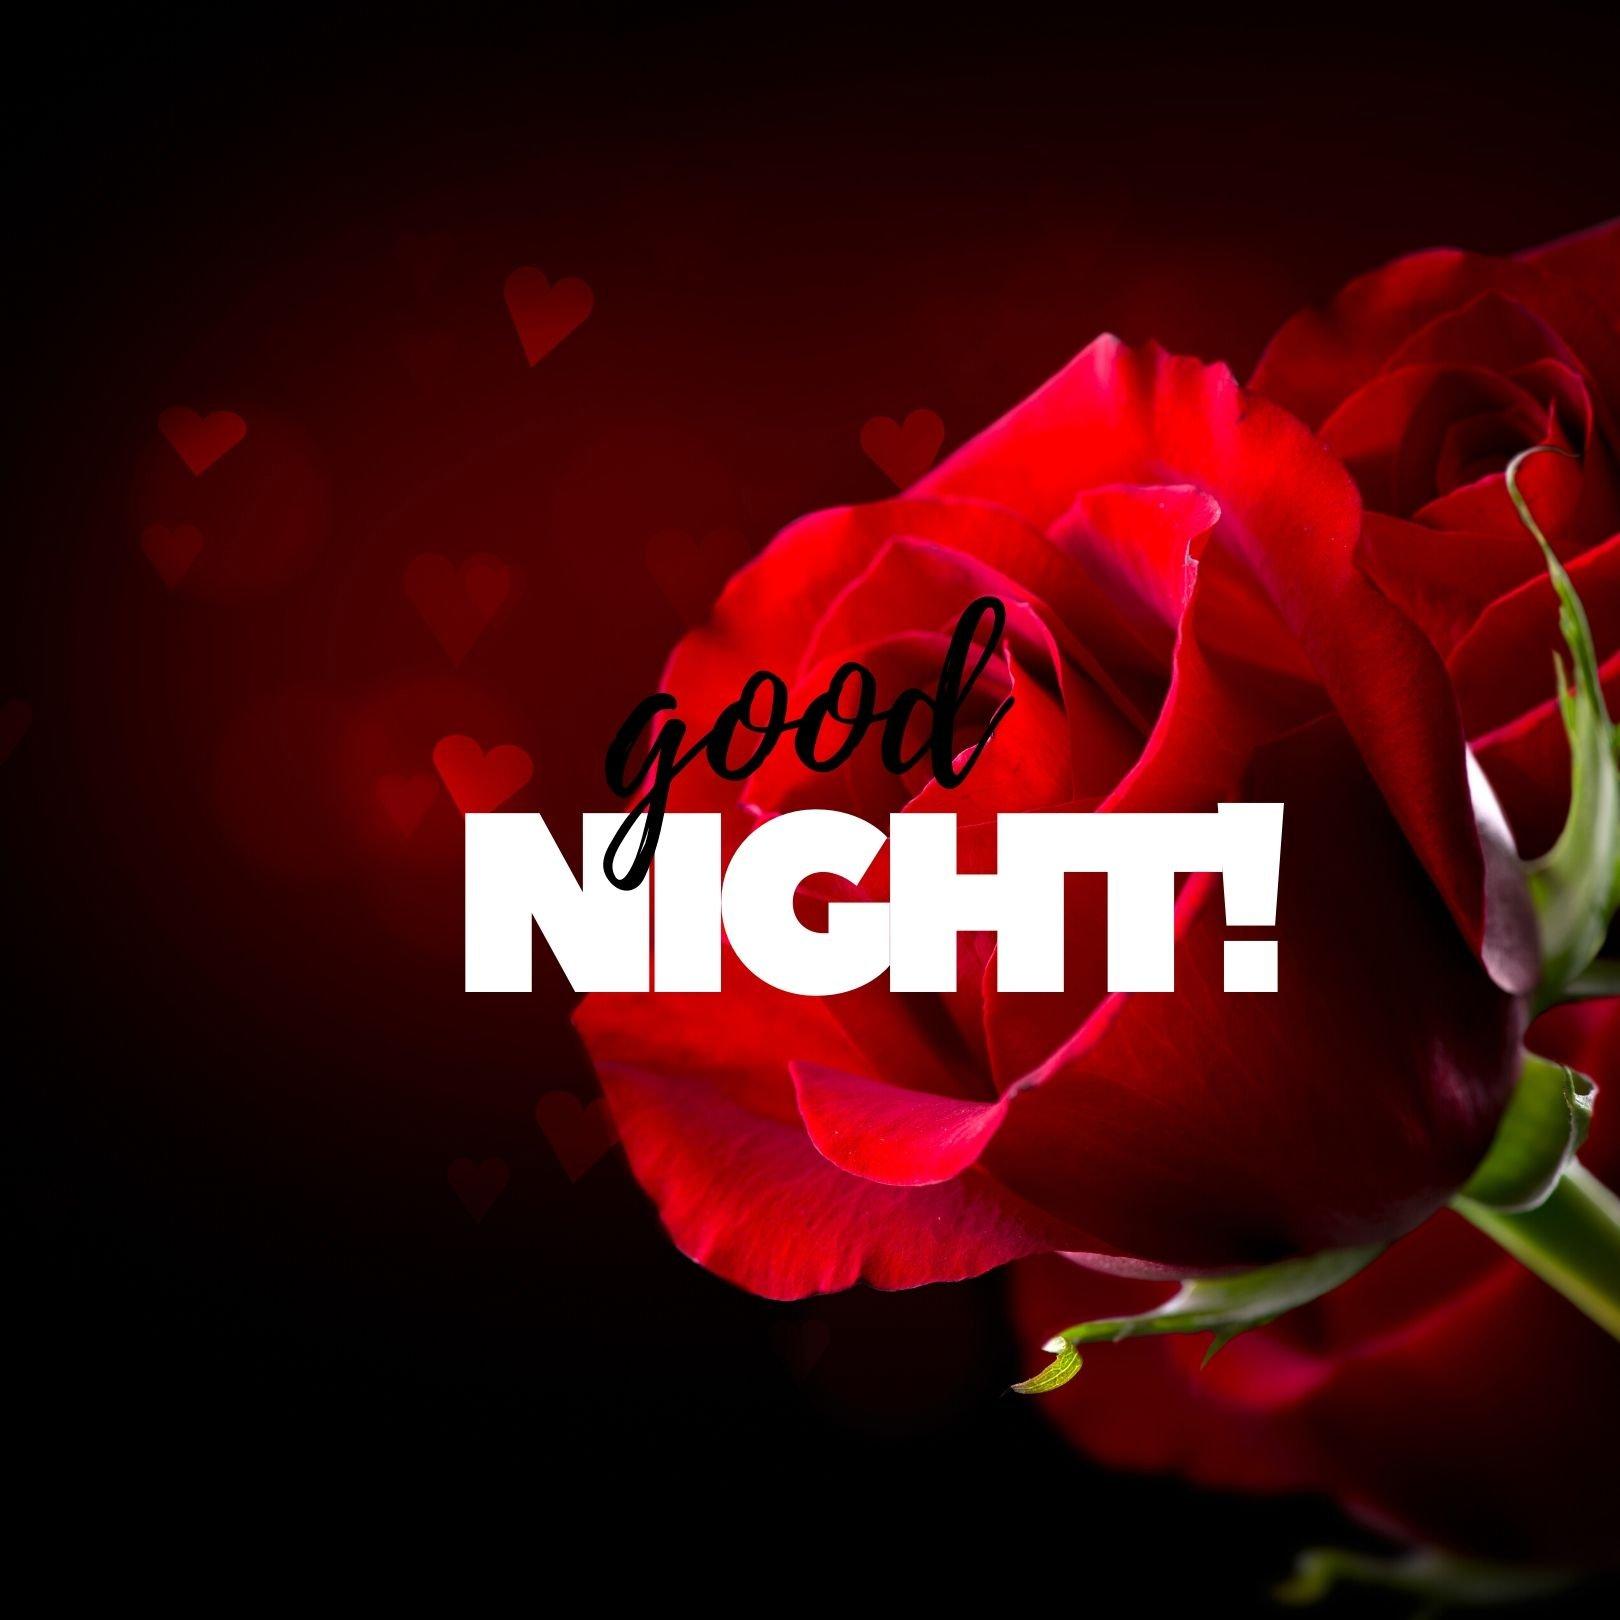 Good Night flower ros image full HD free download.